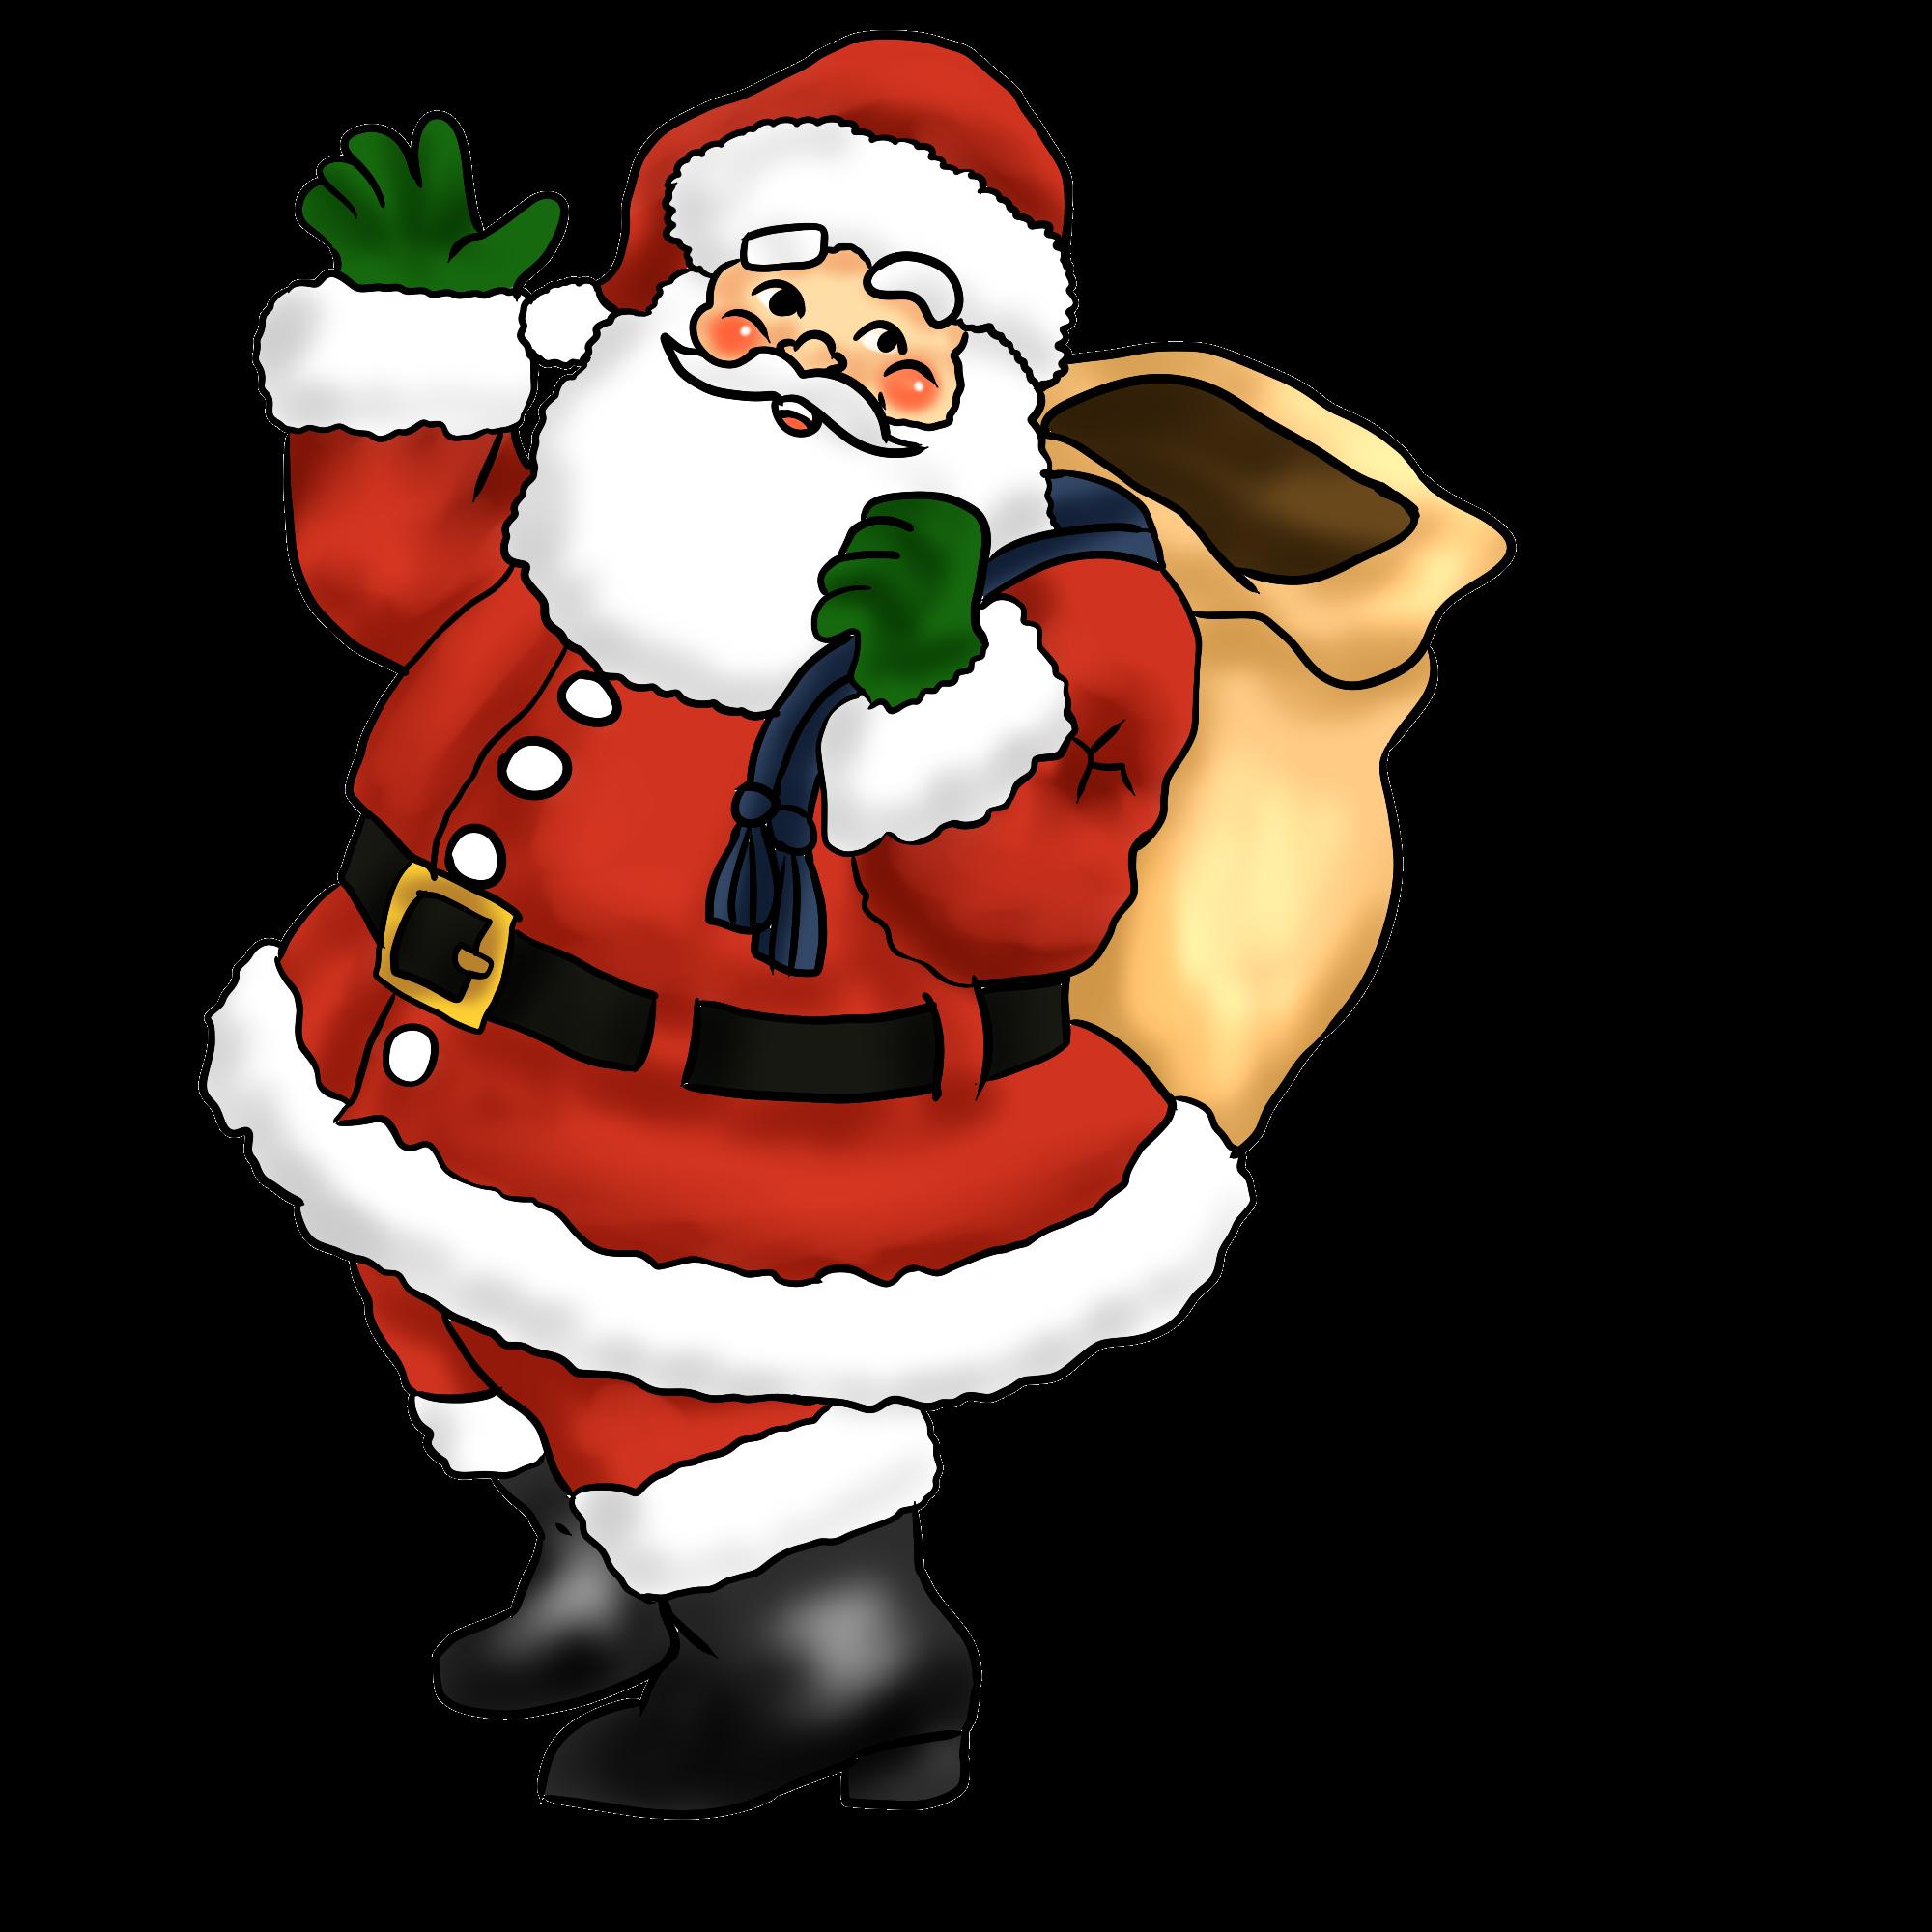 2000x2000 Top 73 Santa Claus Clip Art